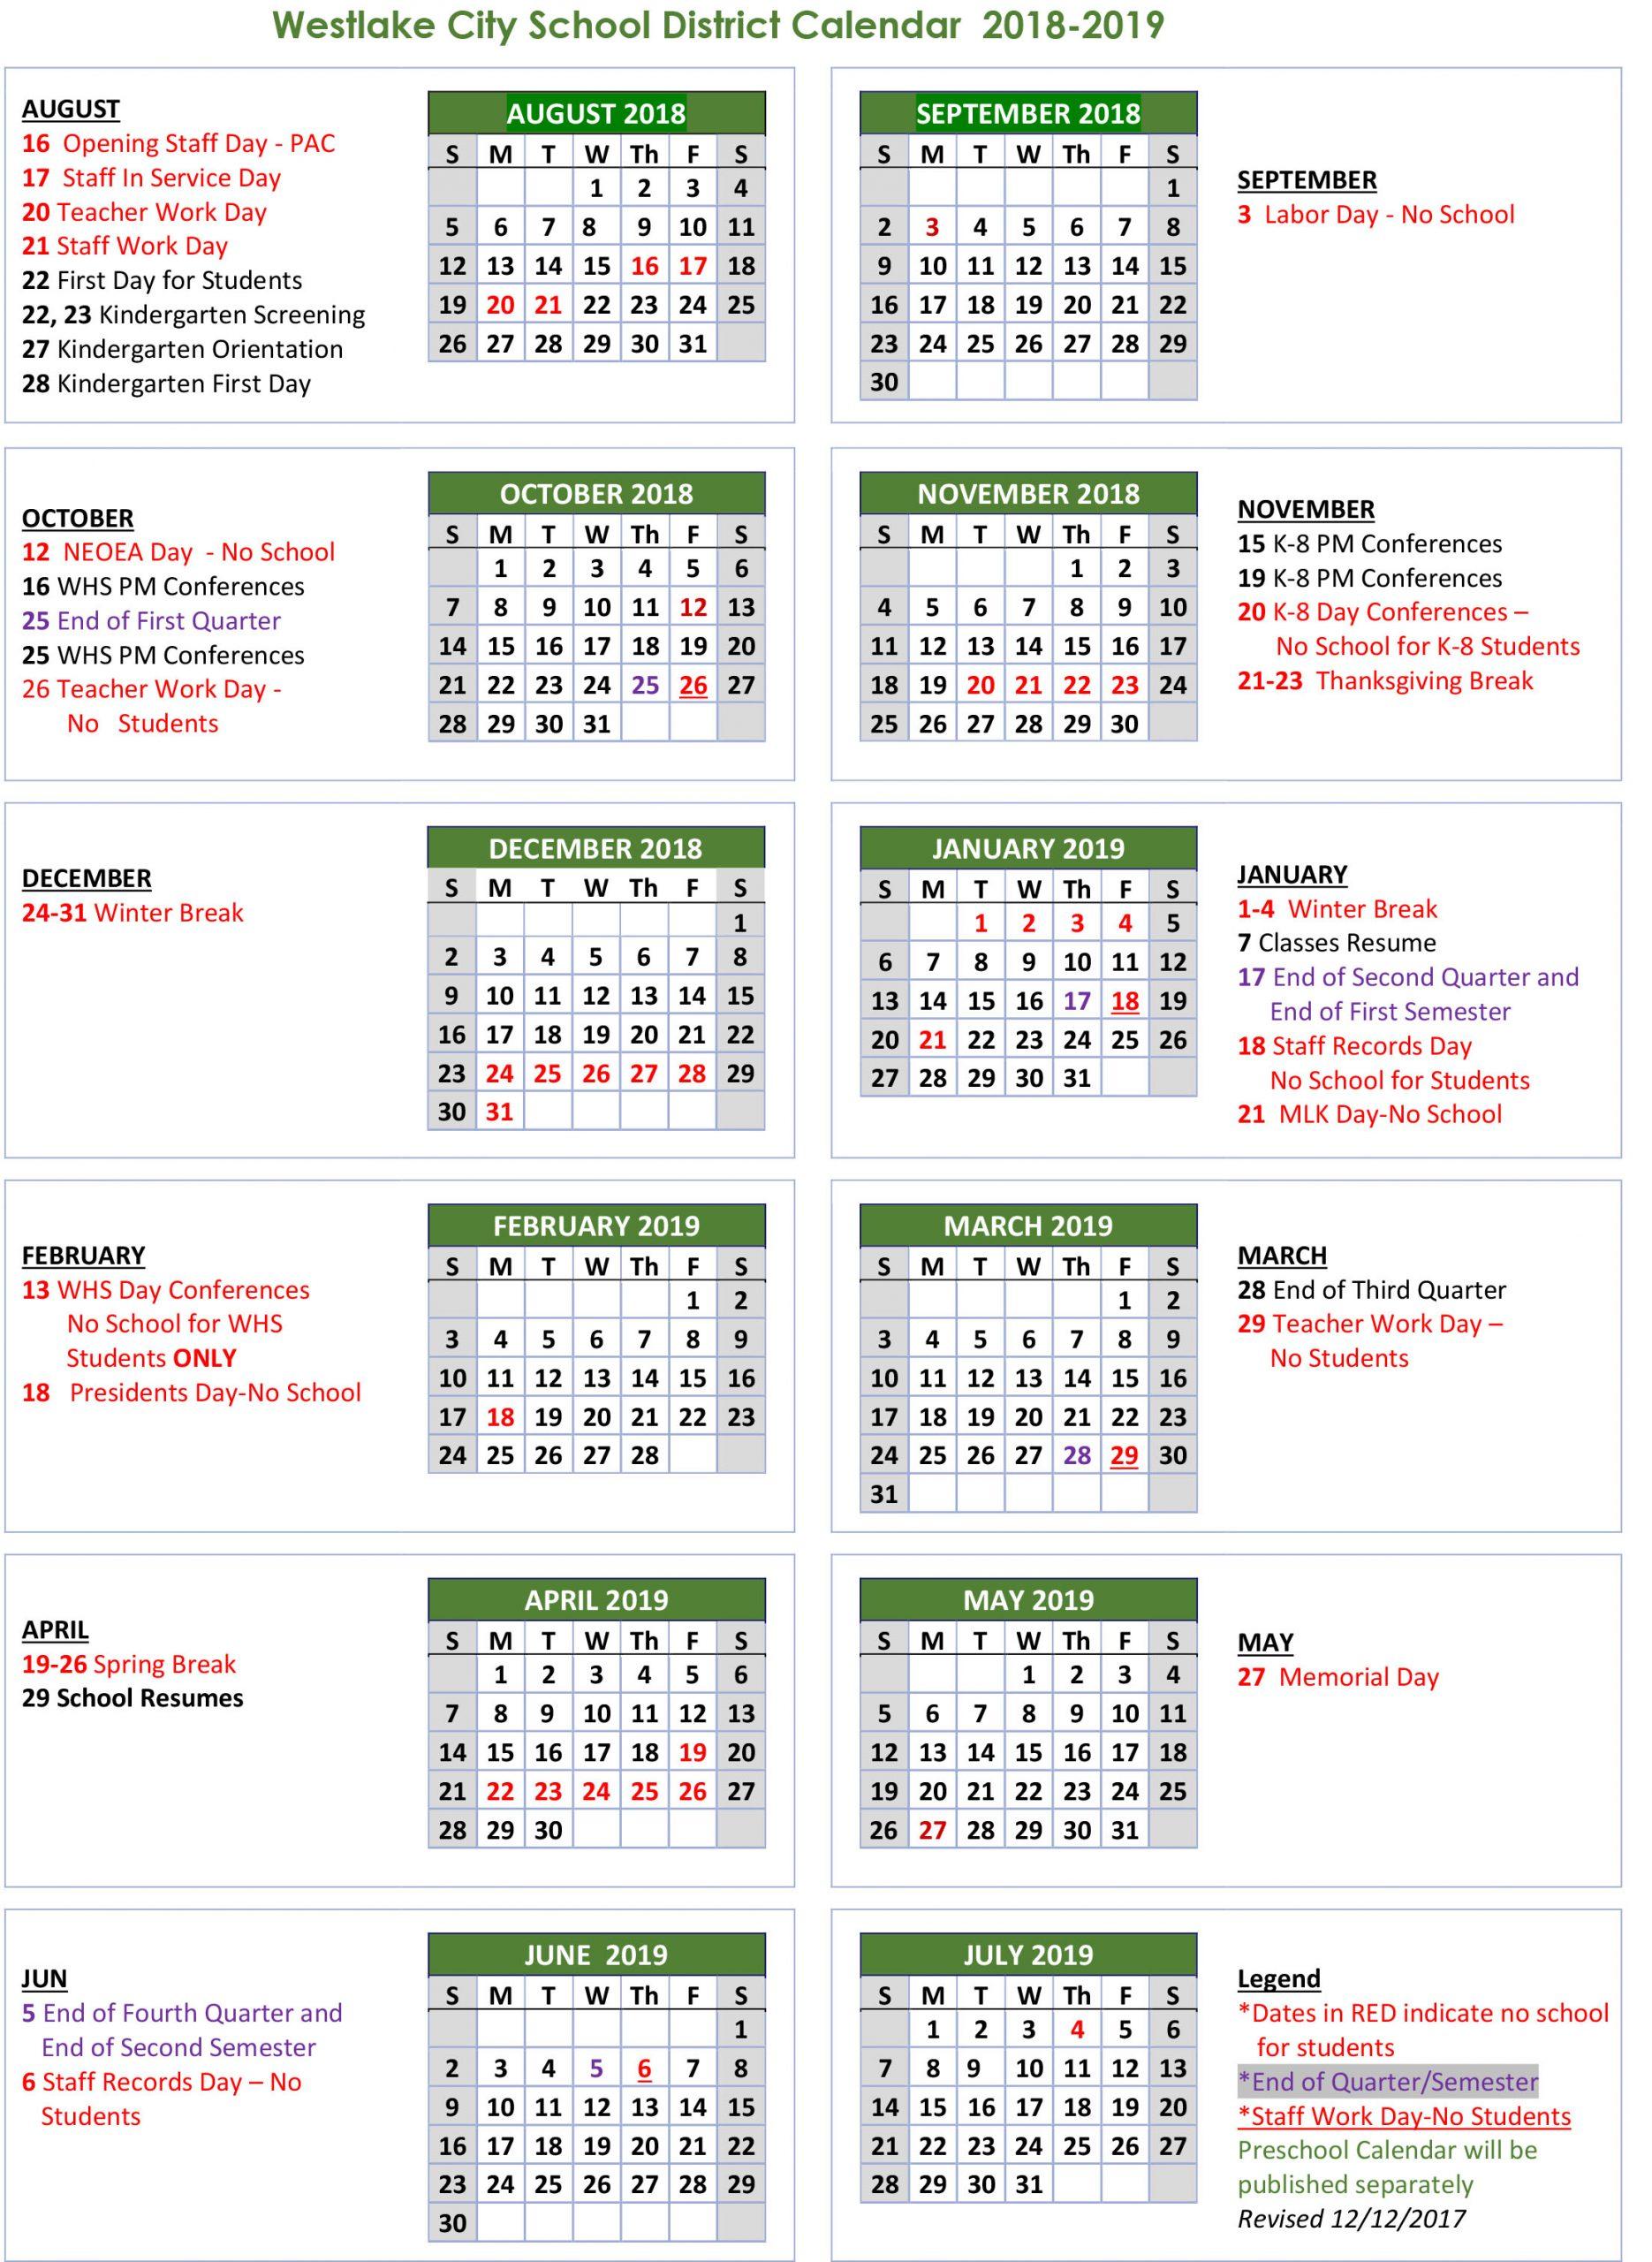 Lee County School Calendar 2020 17 | Exam Calendar Intended For Boyertown School District Calendar 2020 17